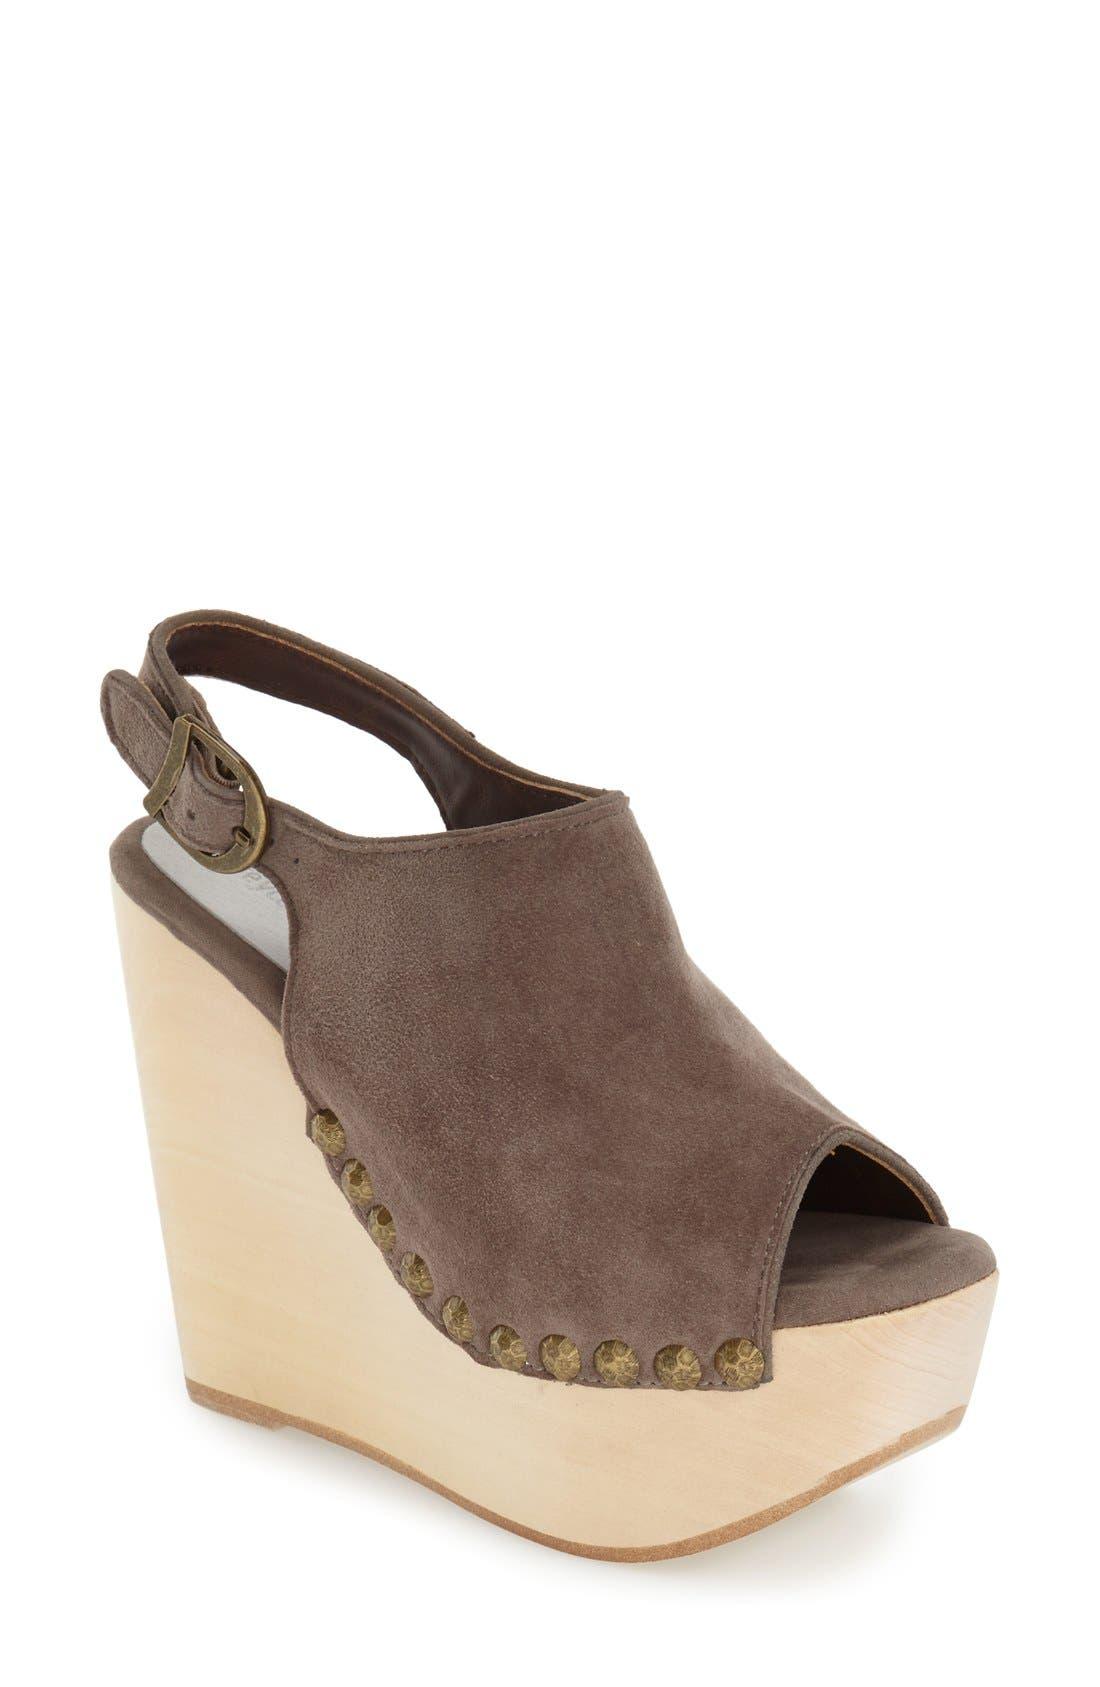 Main Image - Jeffrey Campbell 'Snick' Platform Sandal